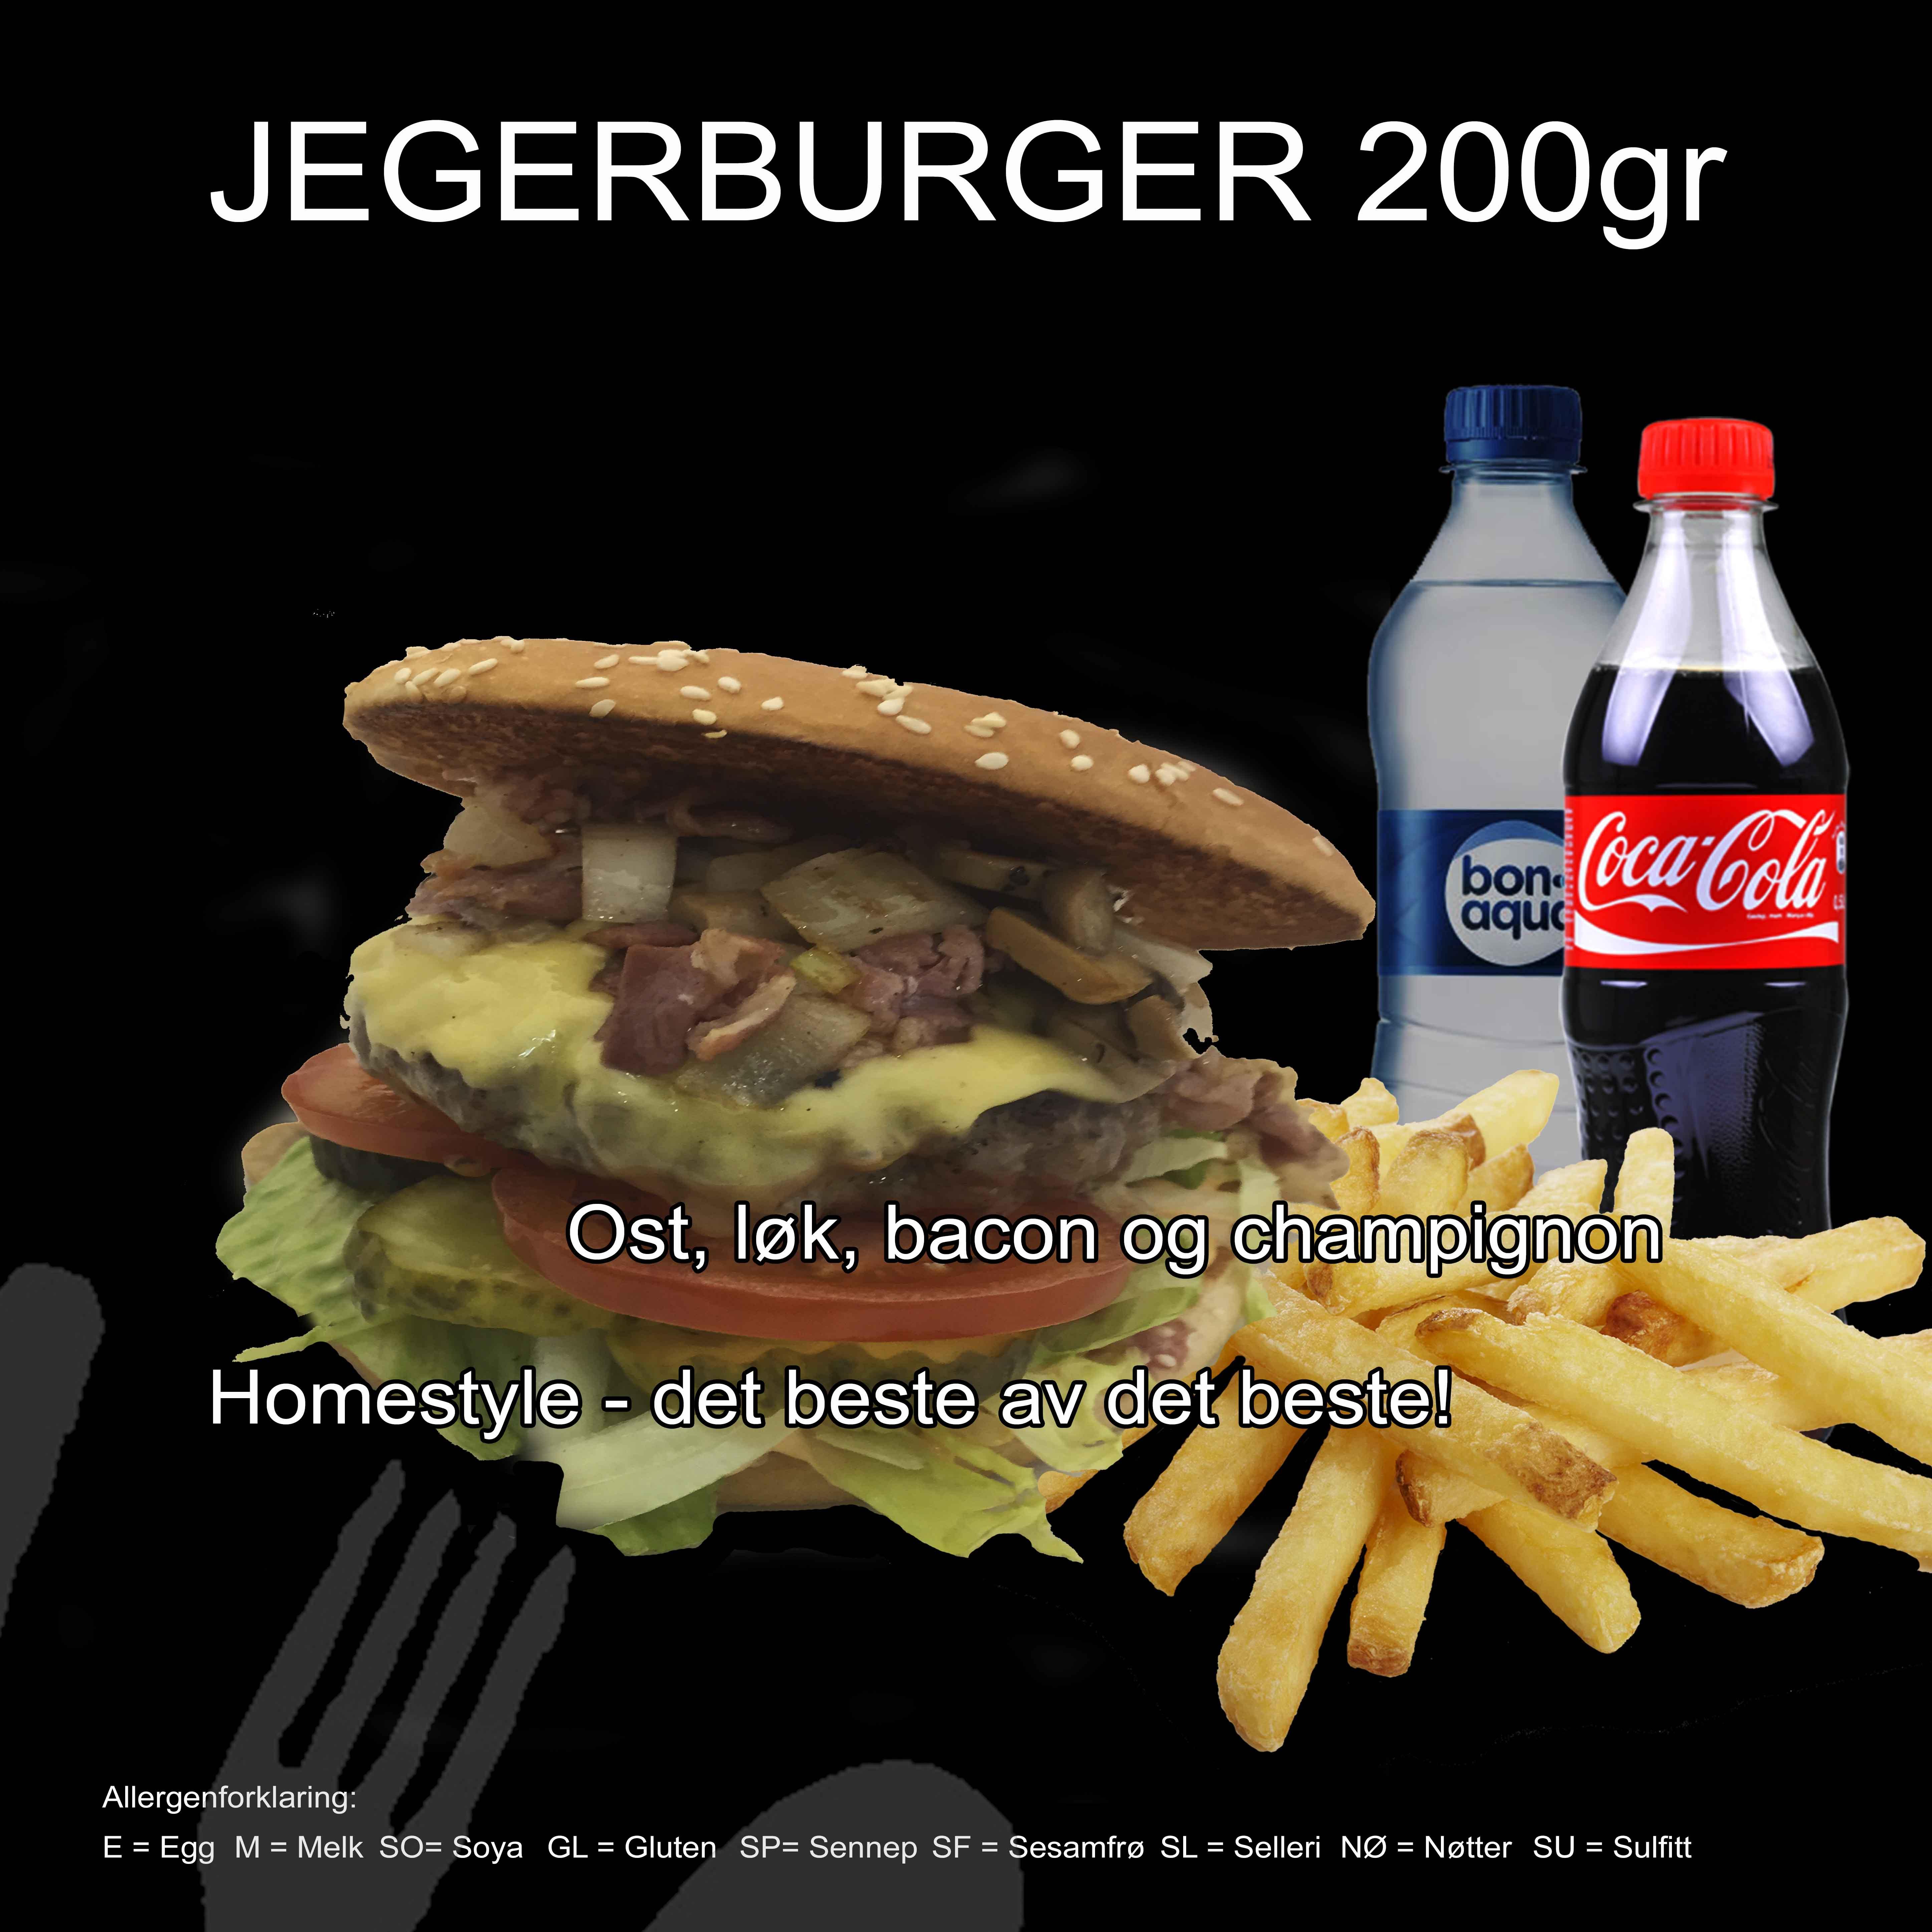 jegerburger.jpg